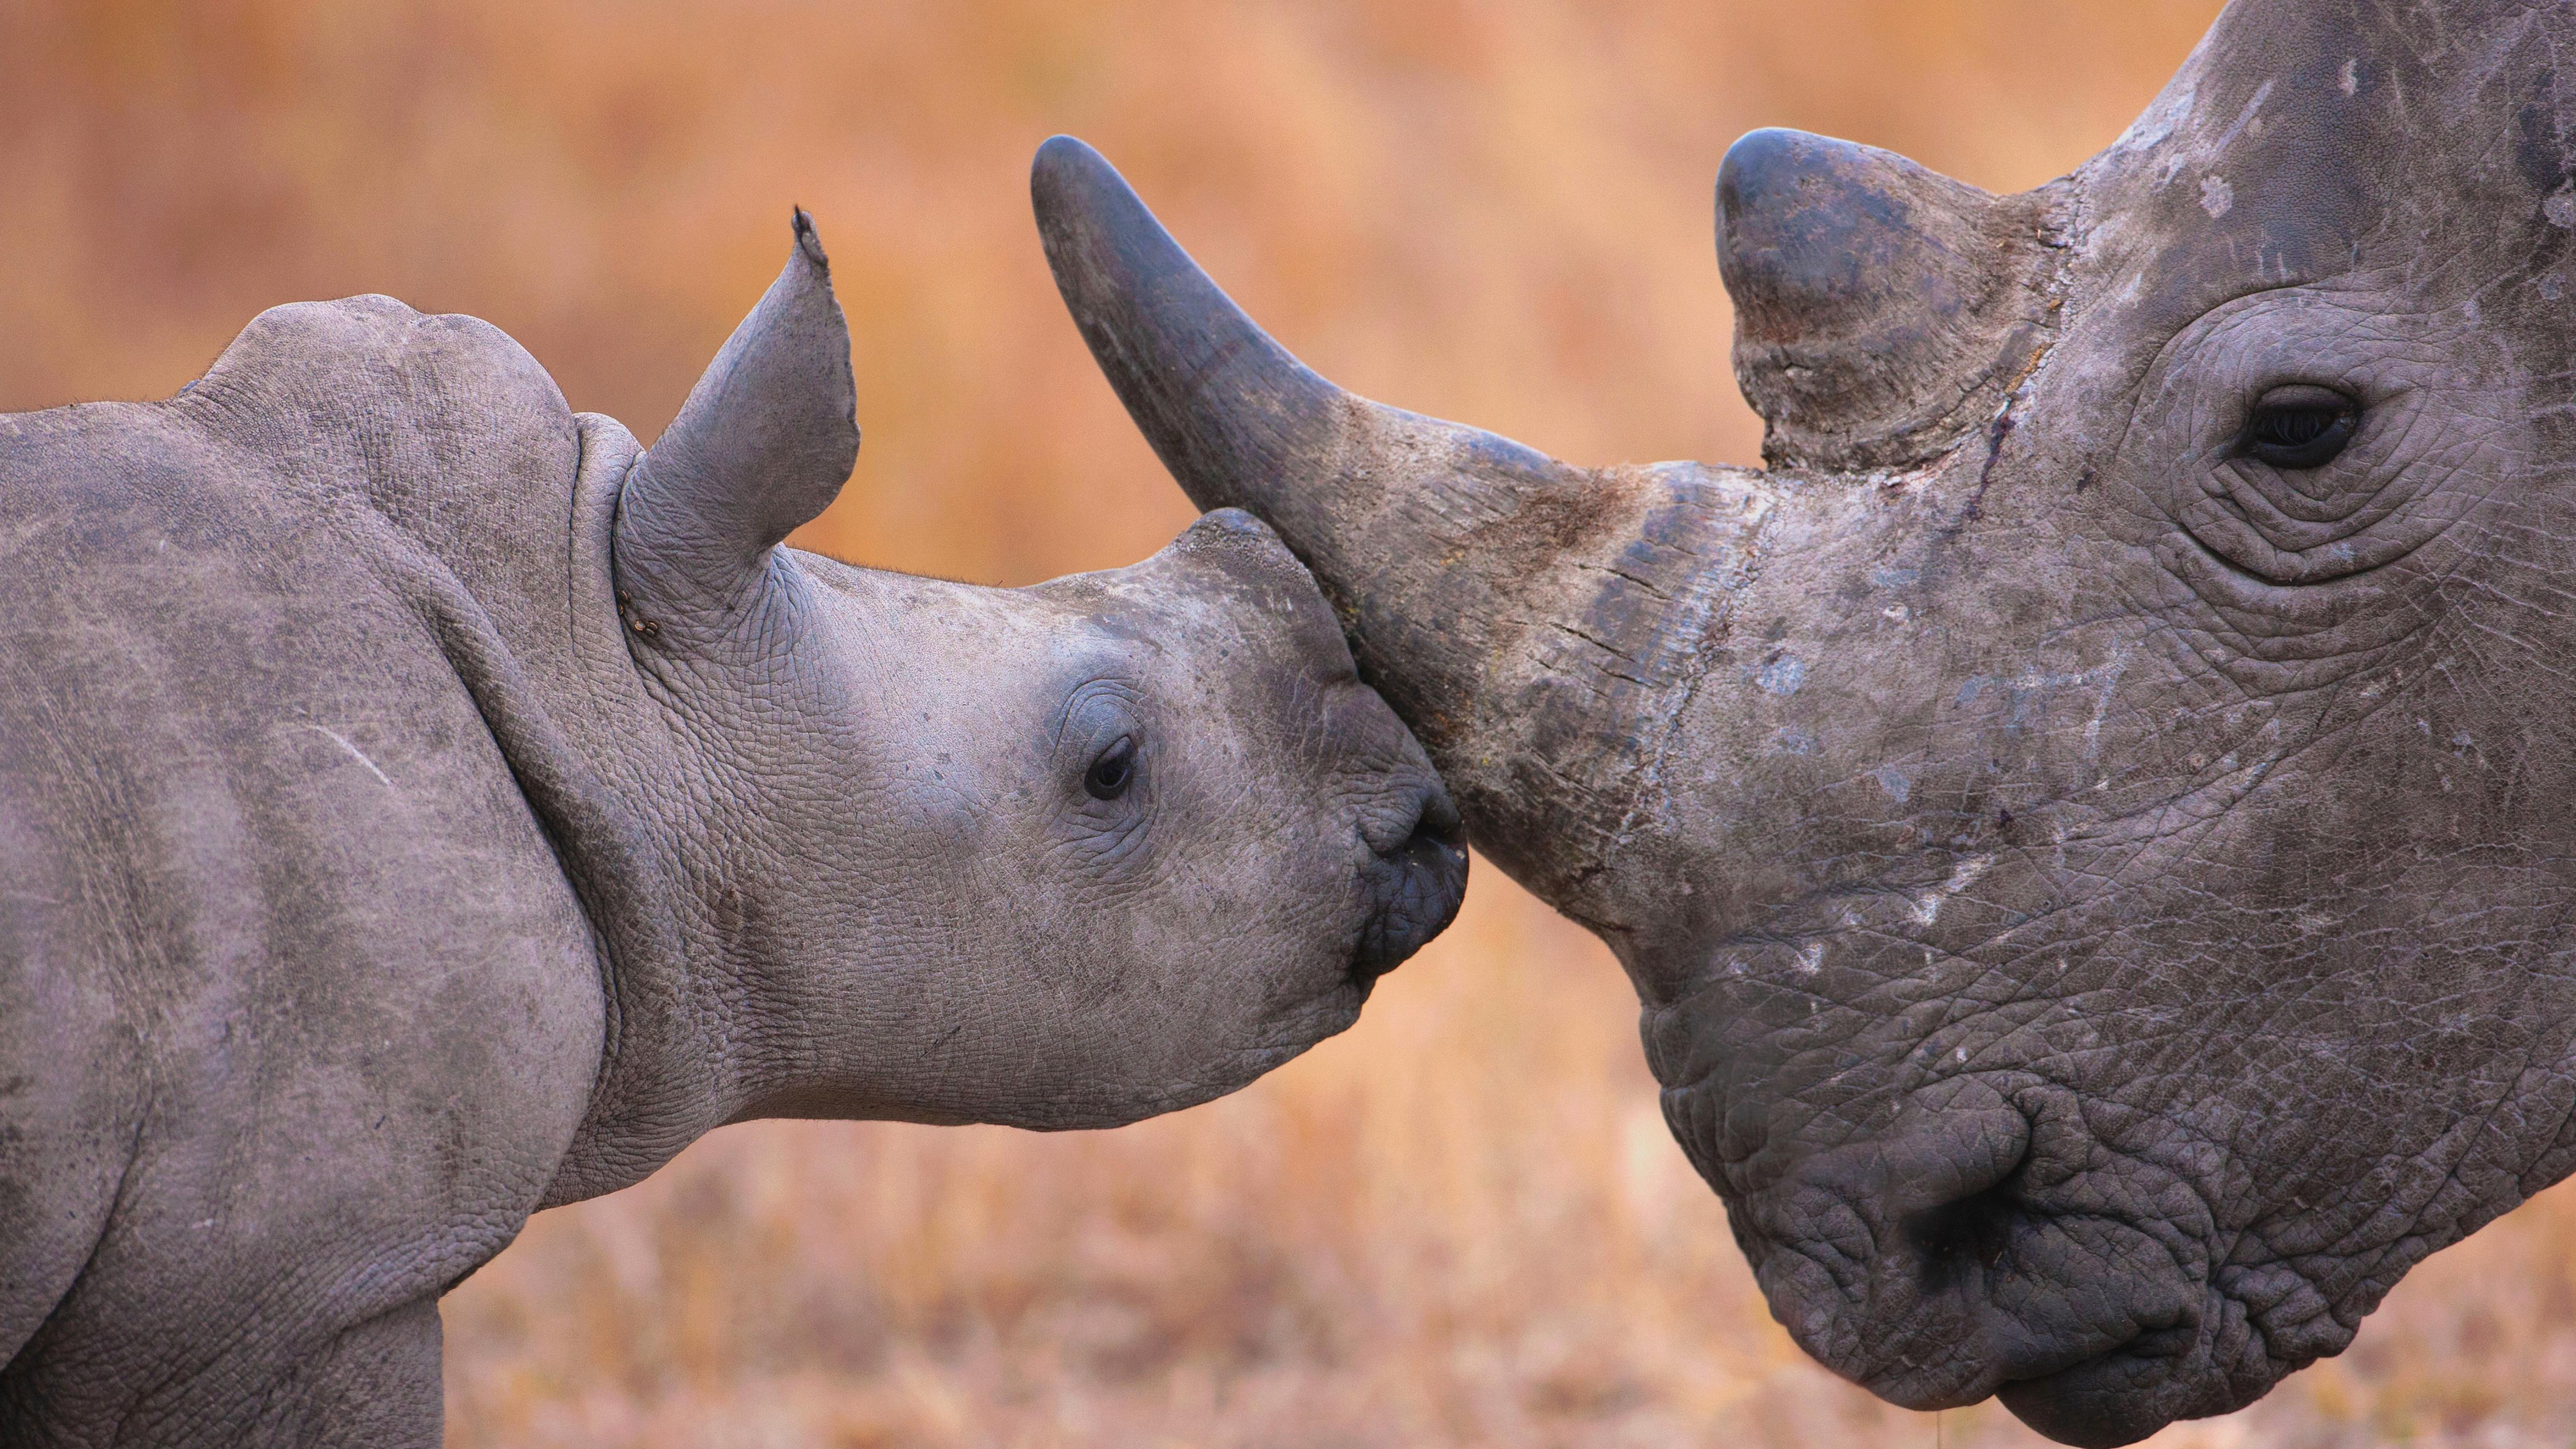 Rhino HD Wallpaper | Background Image | 1920x1200 | ID ...